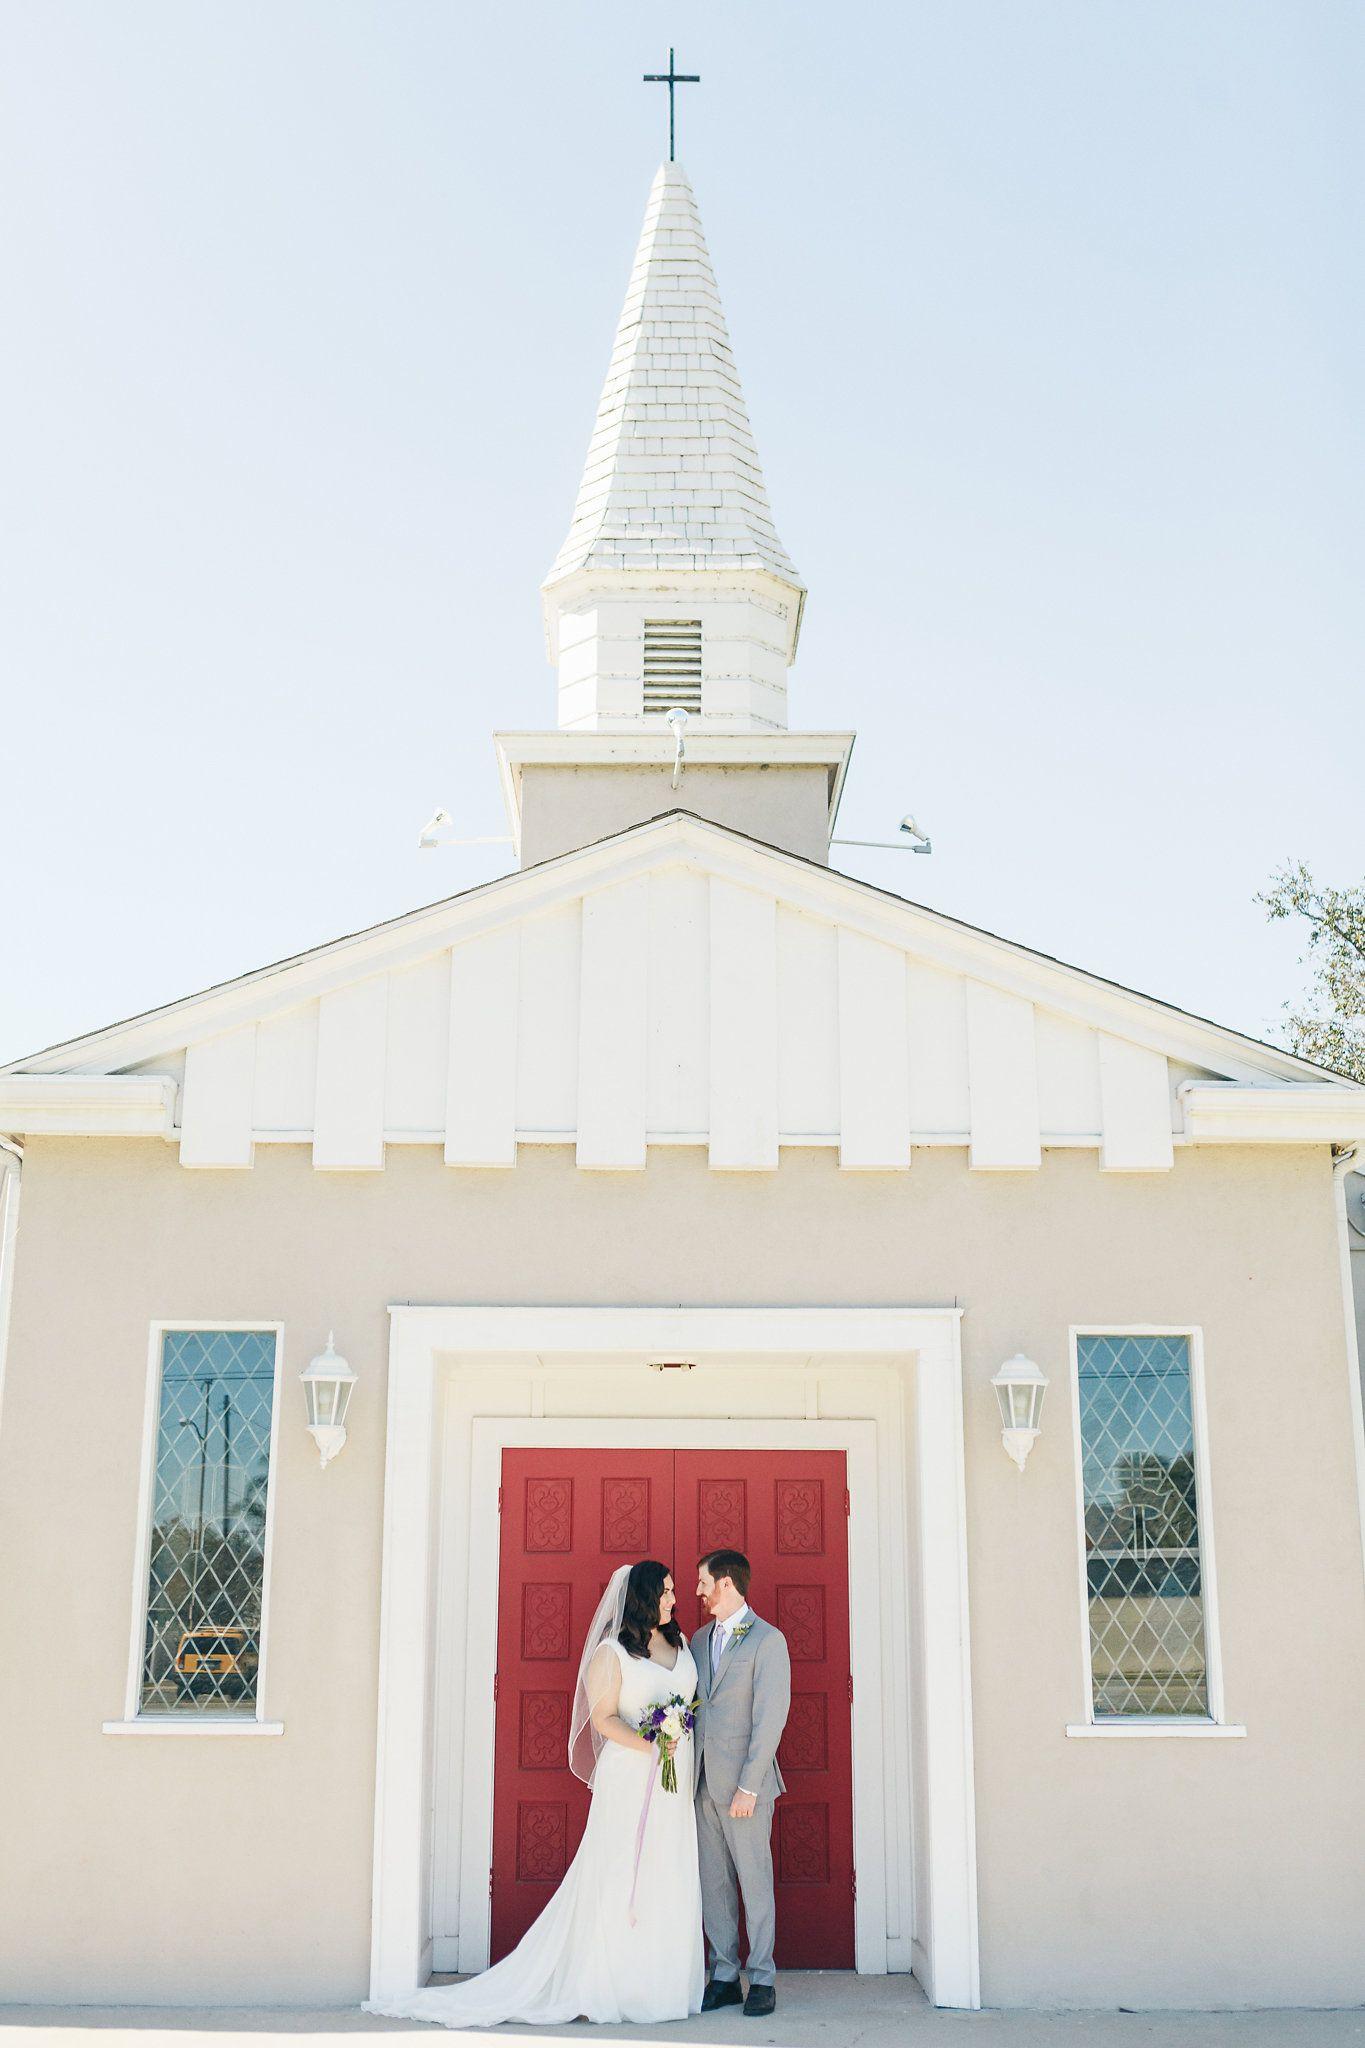 Long Beach Wedding A Walk To Remember Themed Wedding Palm Springs Wedding Photographer Long Beac Wedding Wedding Bride California Wedding